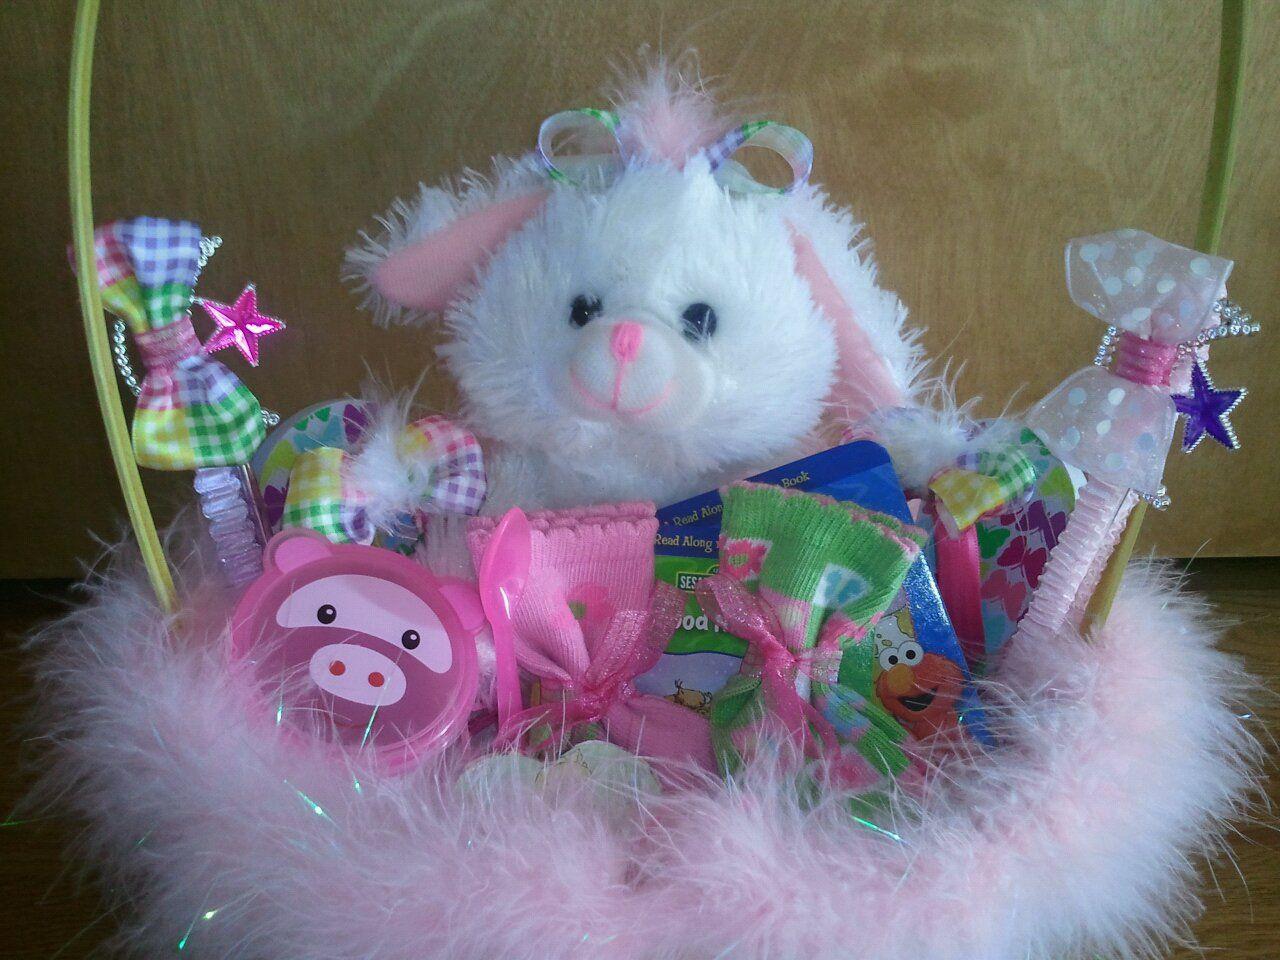 Easter ideas part 3 of 3 real deep stuff - Baby Girls Easter Basket Www Babyrificgifts Com Easter Stuffeaster Basketseaster